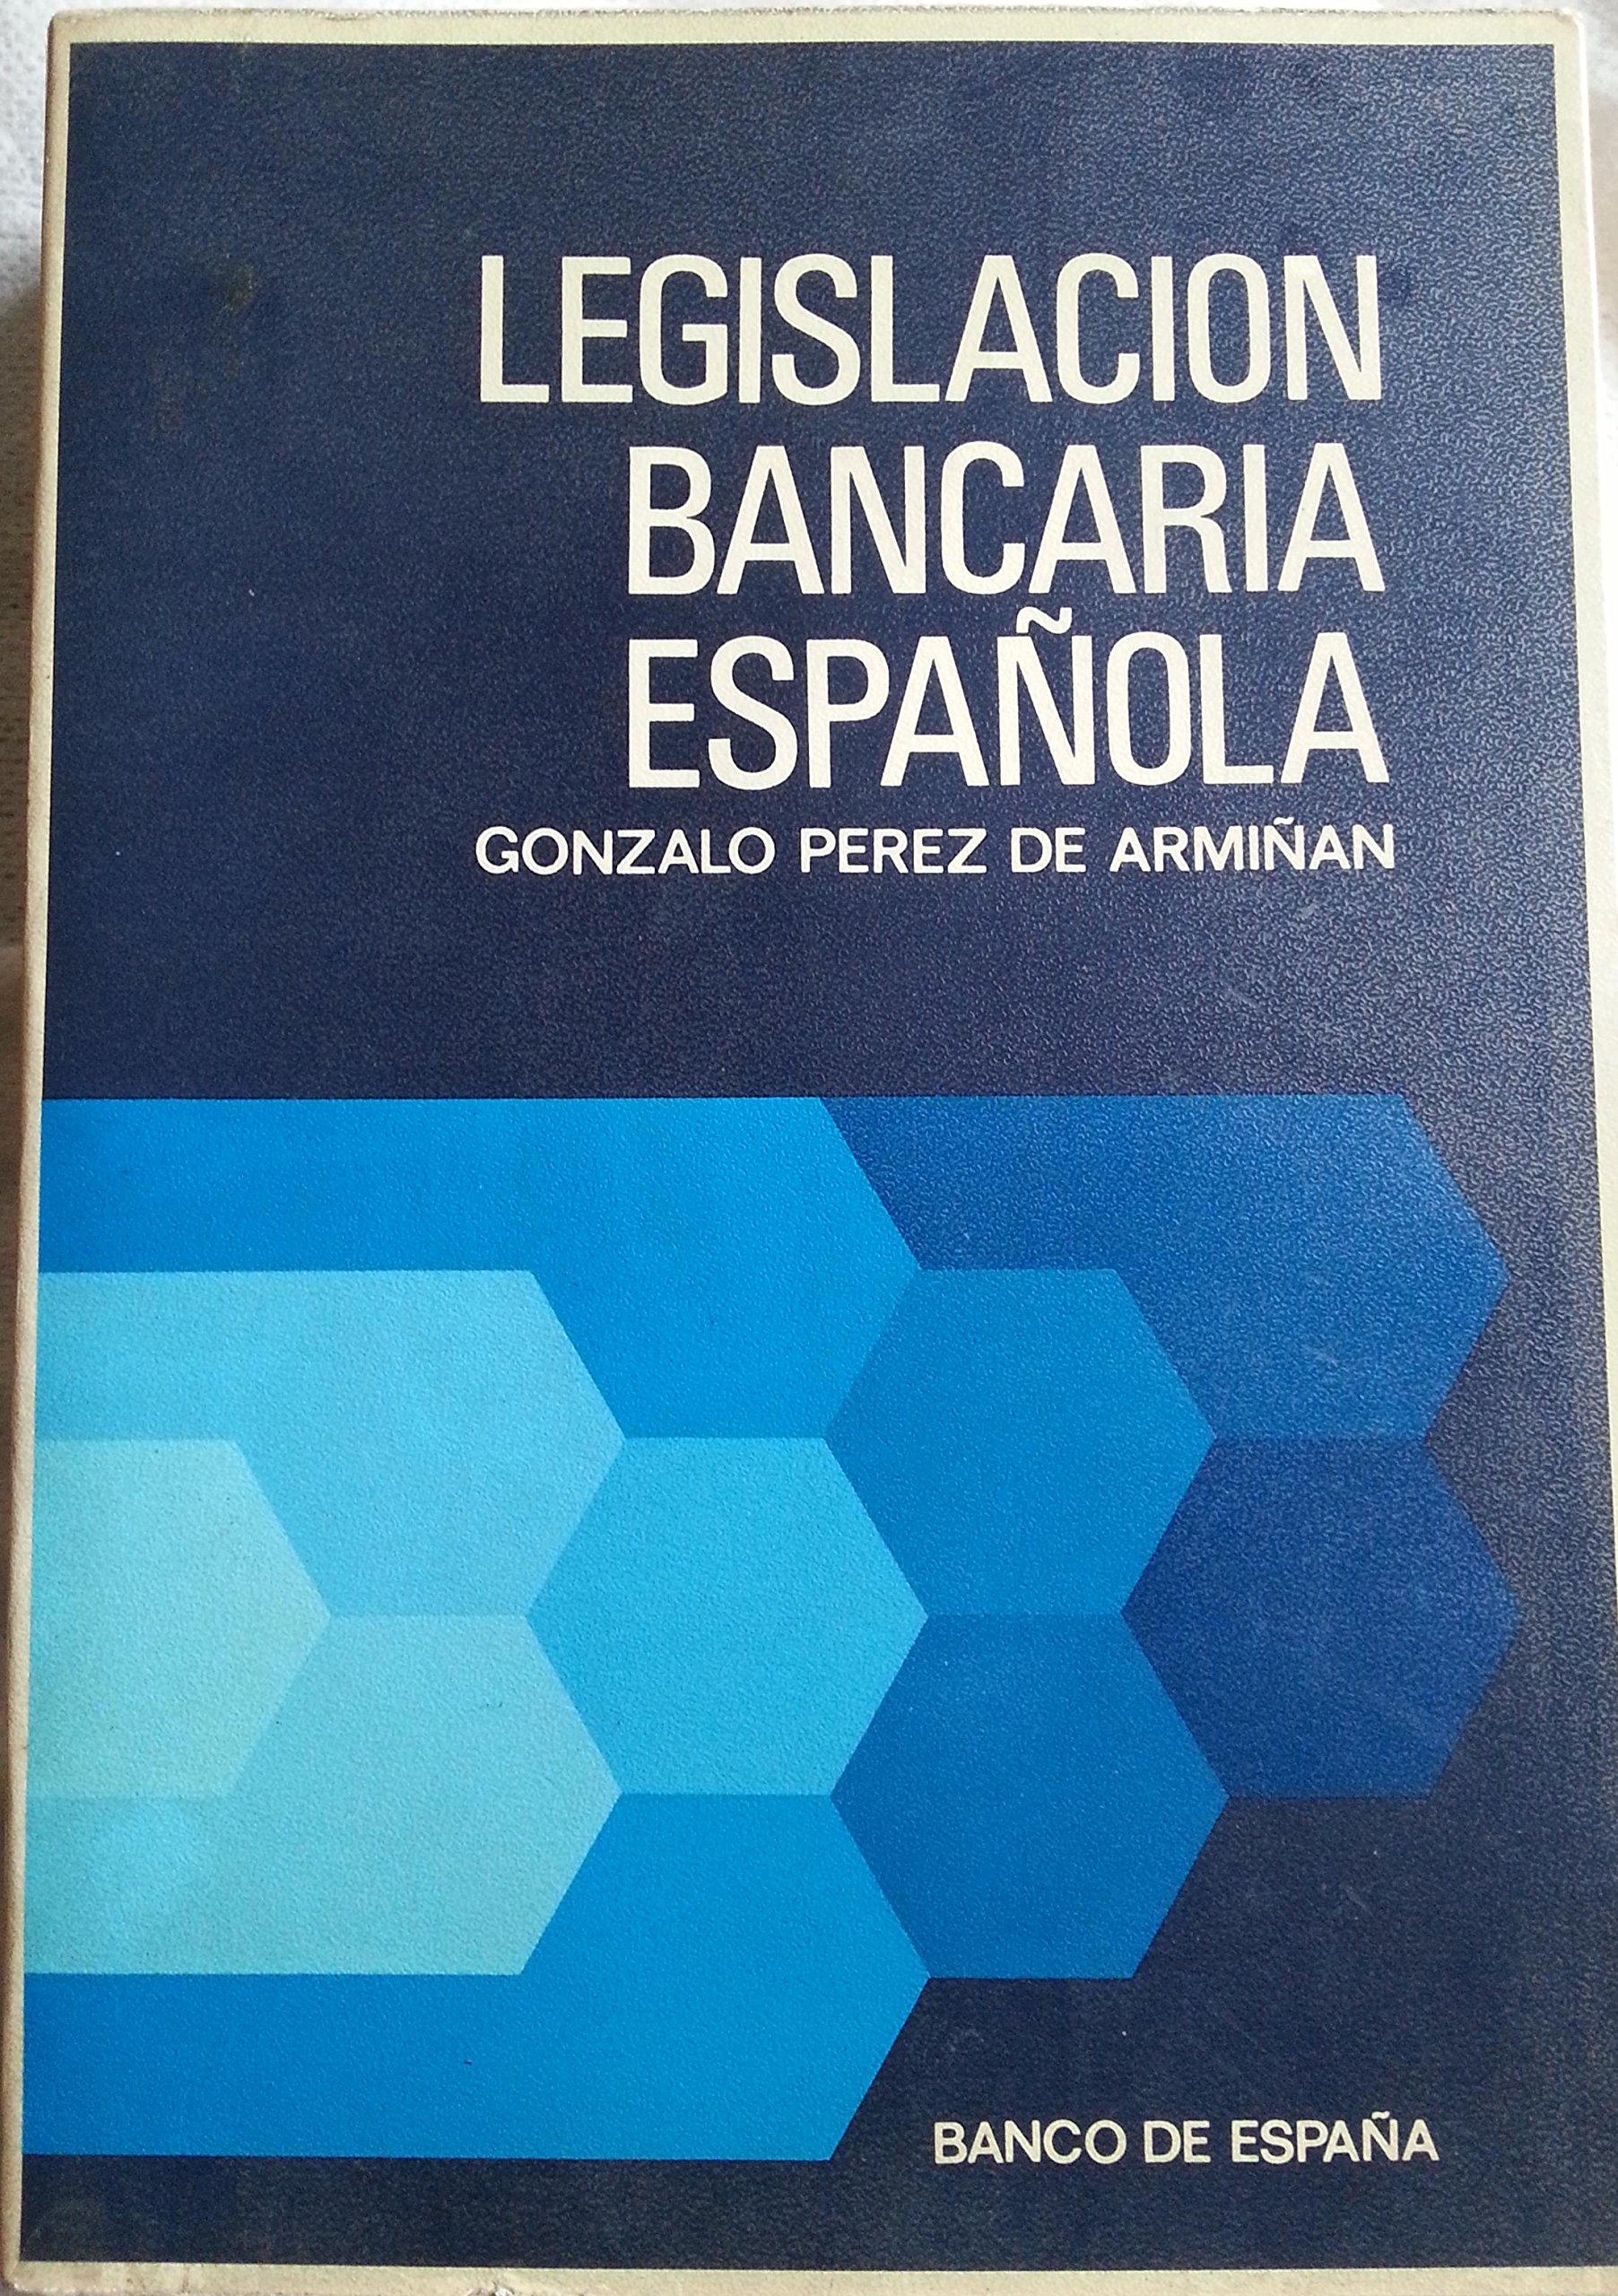 Legislación bancaria española: Amazon.es: Pérez de Armiñán, Gonzalo: Libros en idiomas extranjeros